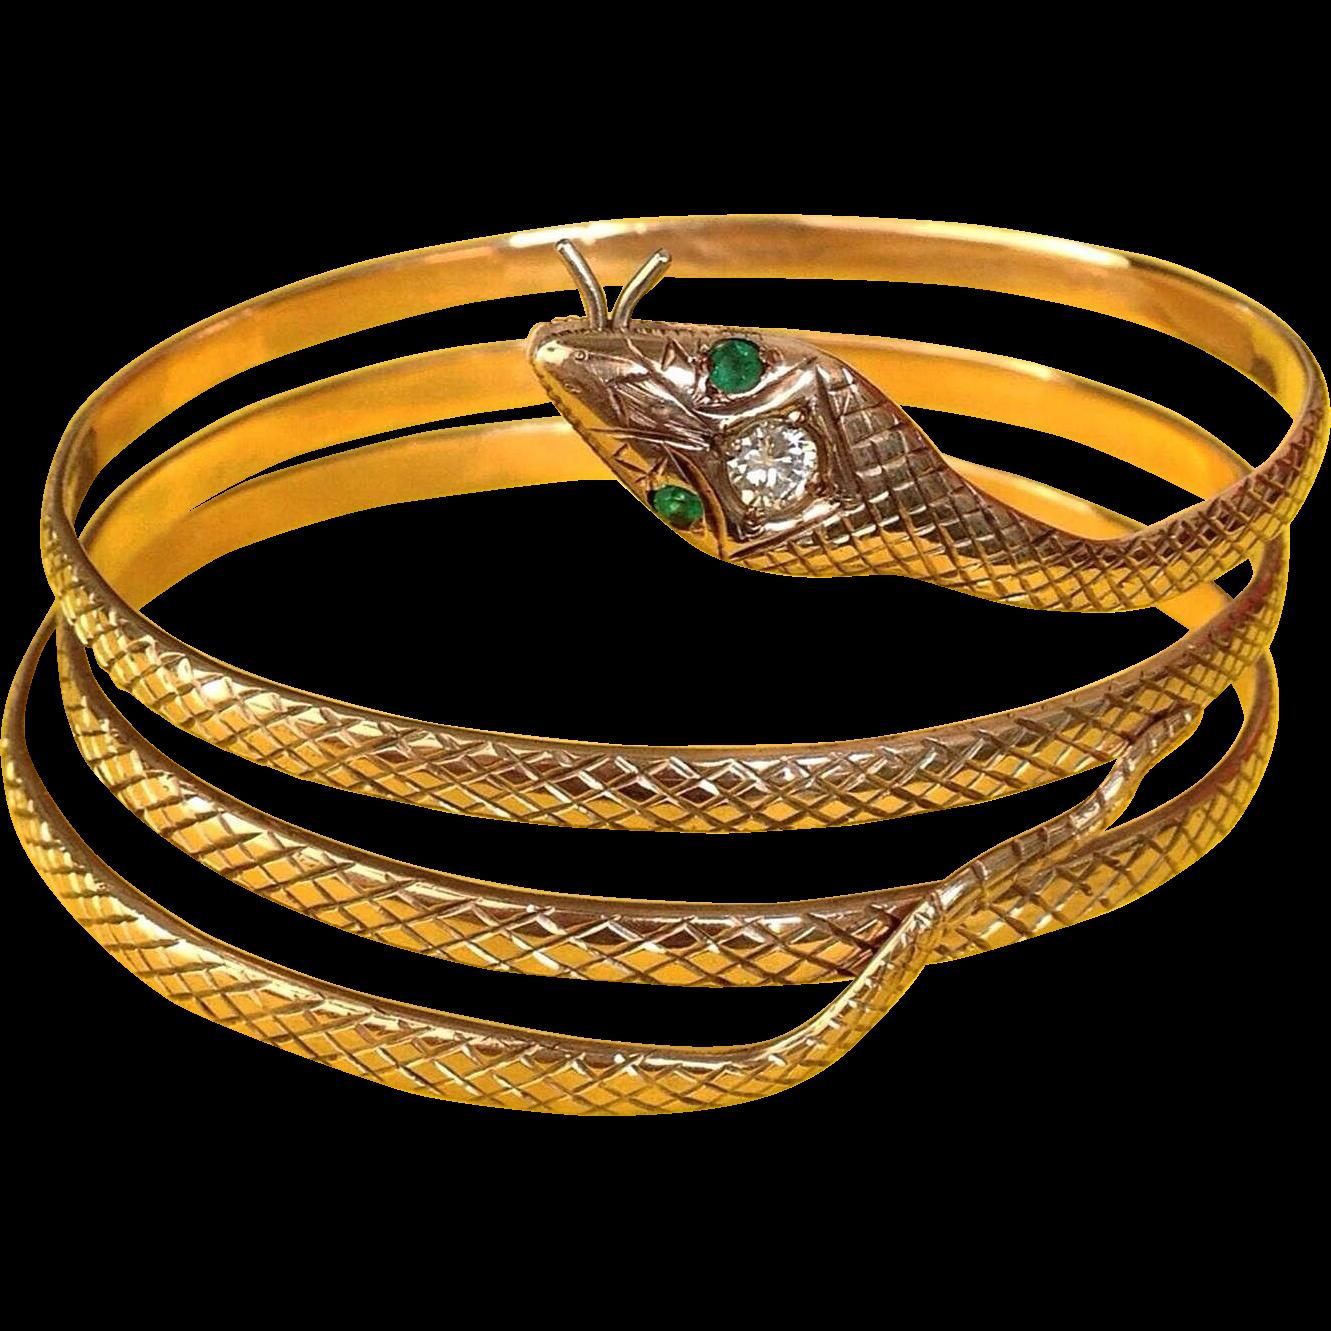 Shop for unique and designer 14k gold bracelets from the world's best jewelers at 1stdibs. 14k yellow gold green enamel diamond Snake hinged bangle bracelet.